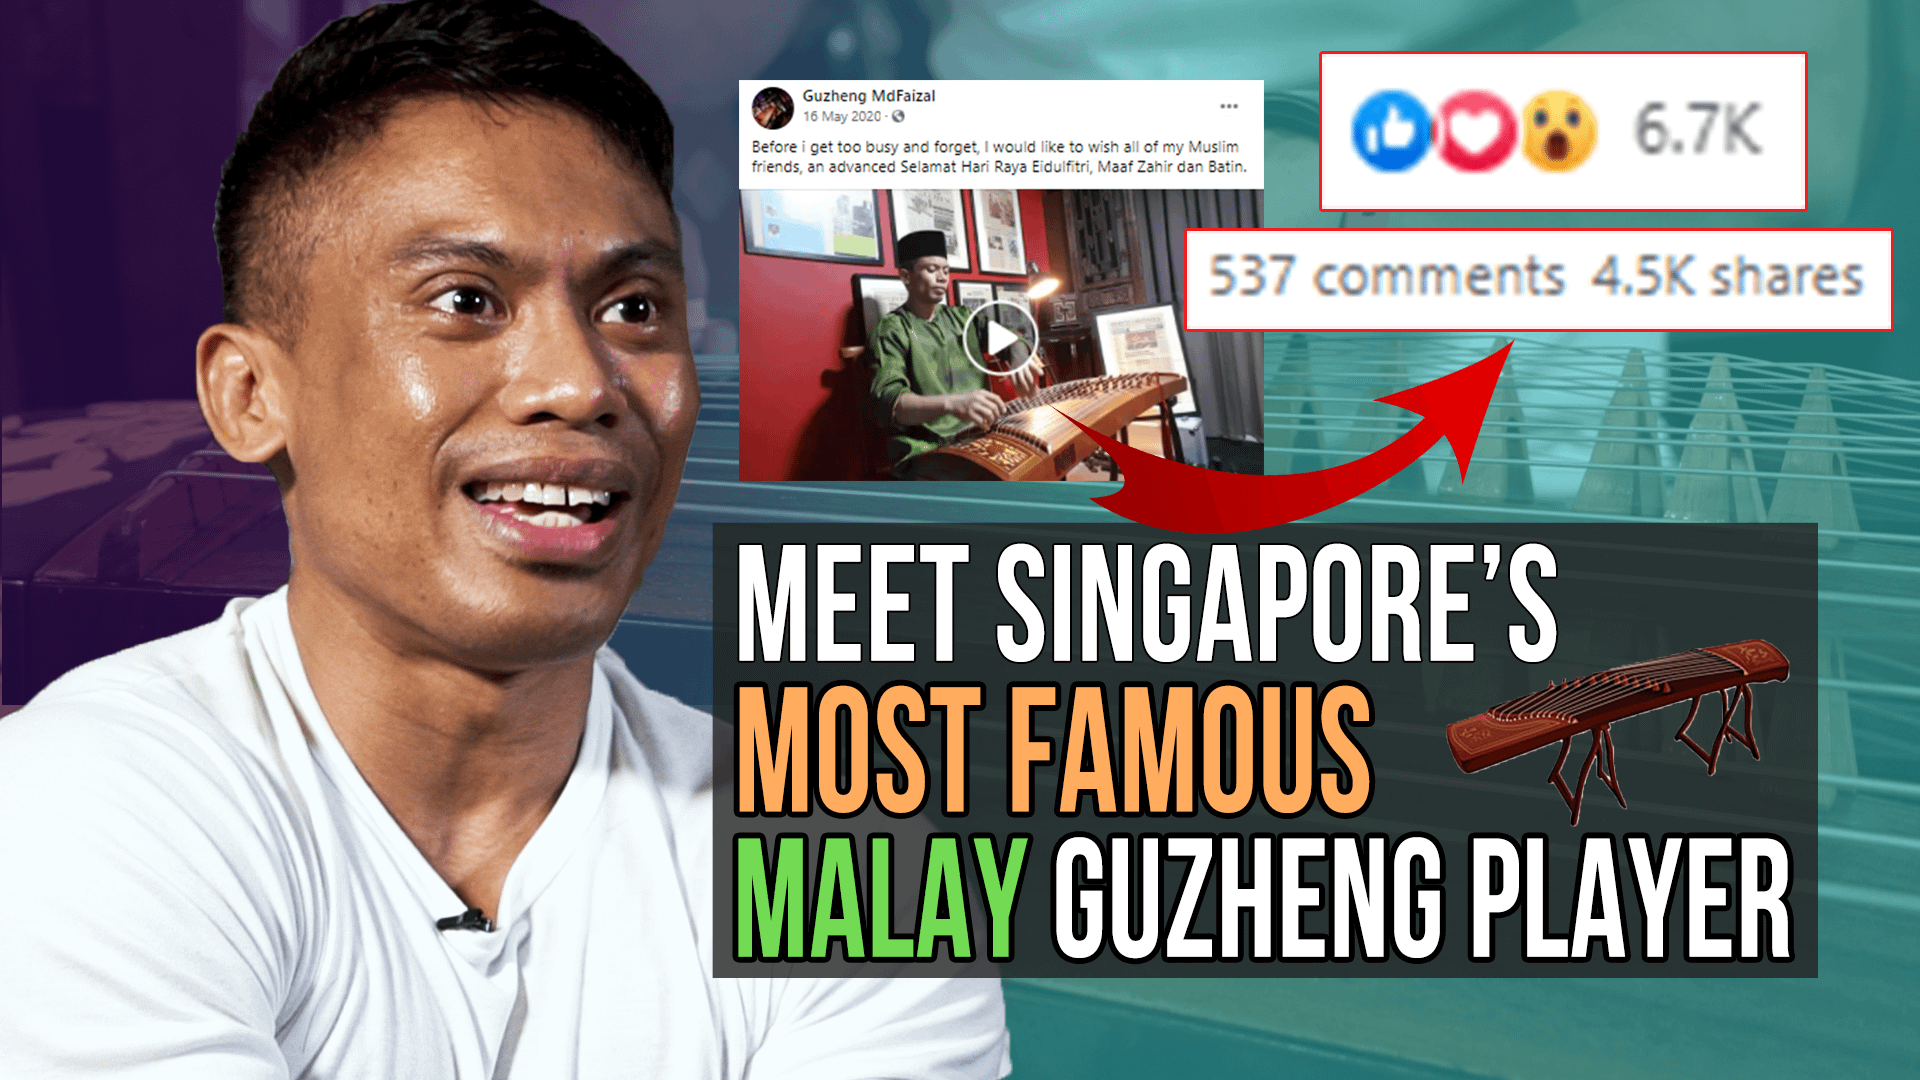 Meet Singapore's most famous Malay Guzheng player!